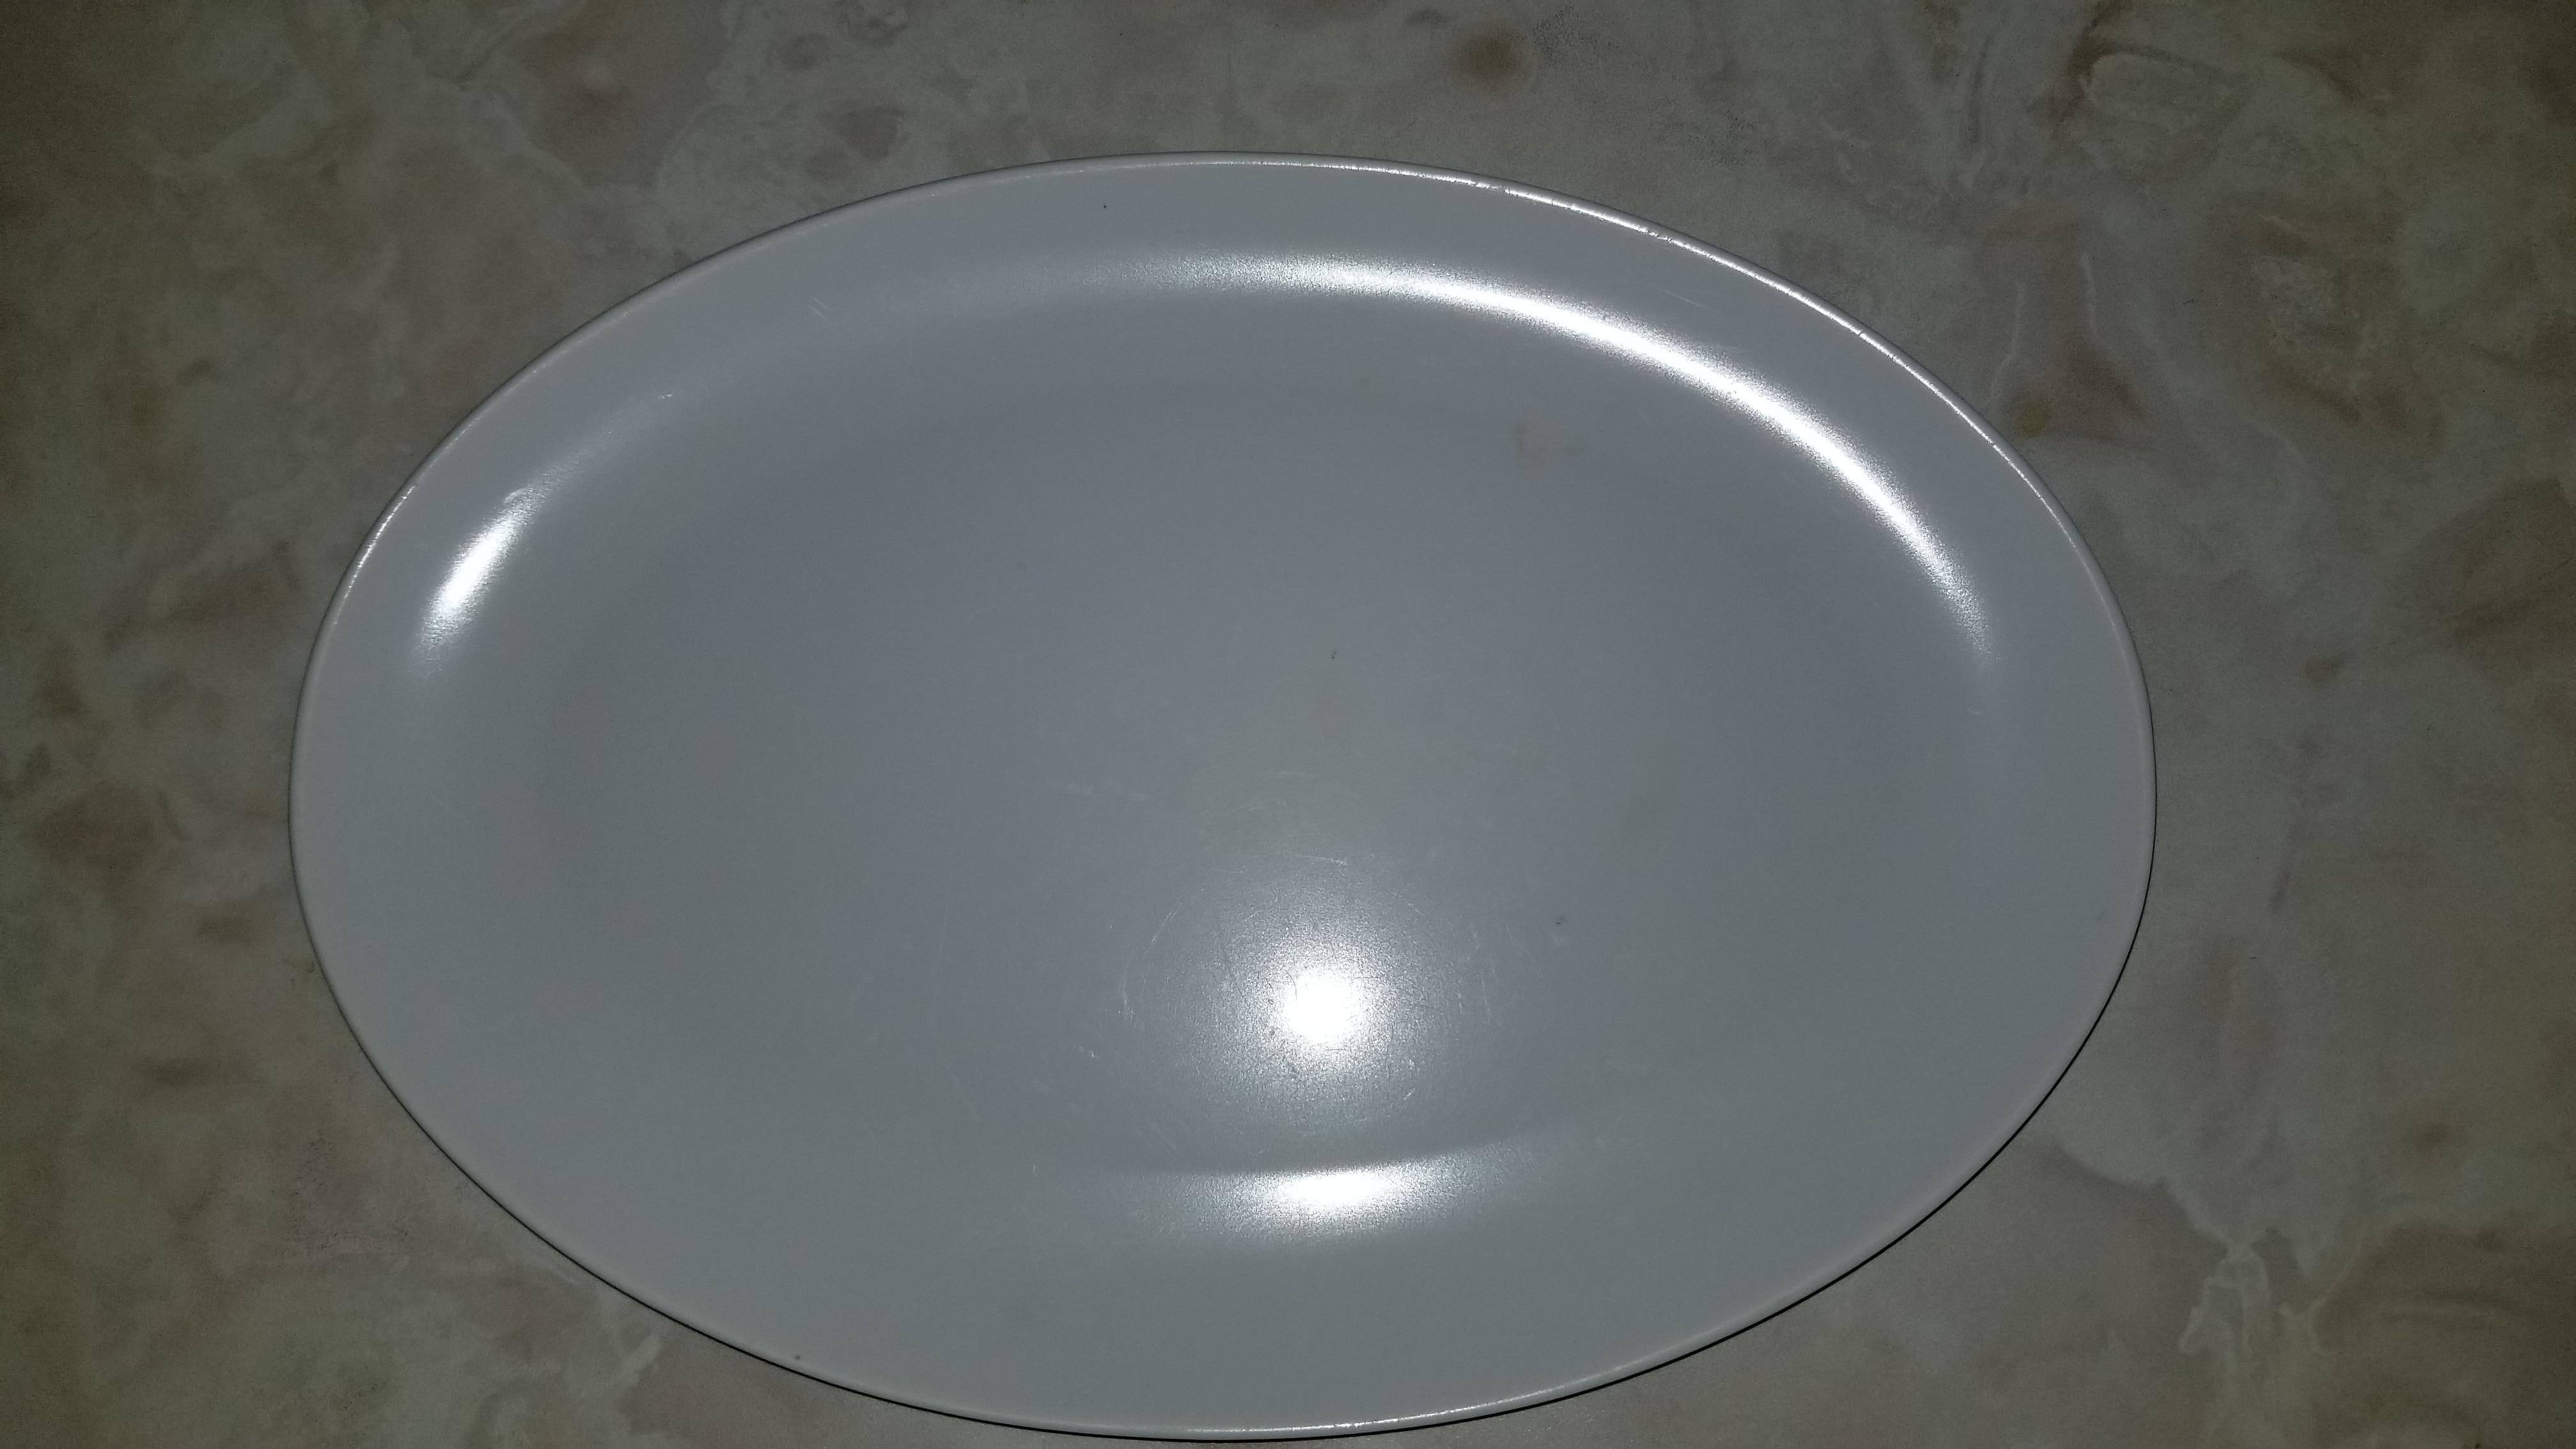 Tabletop Wine Rack-Meat platter for pattern